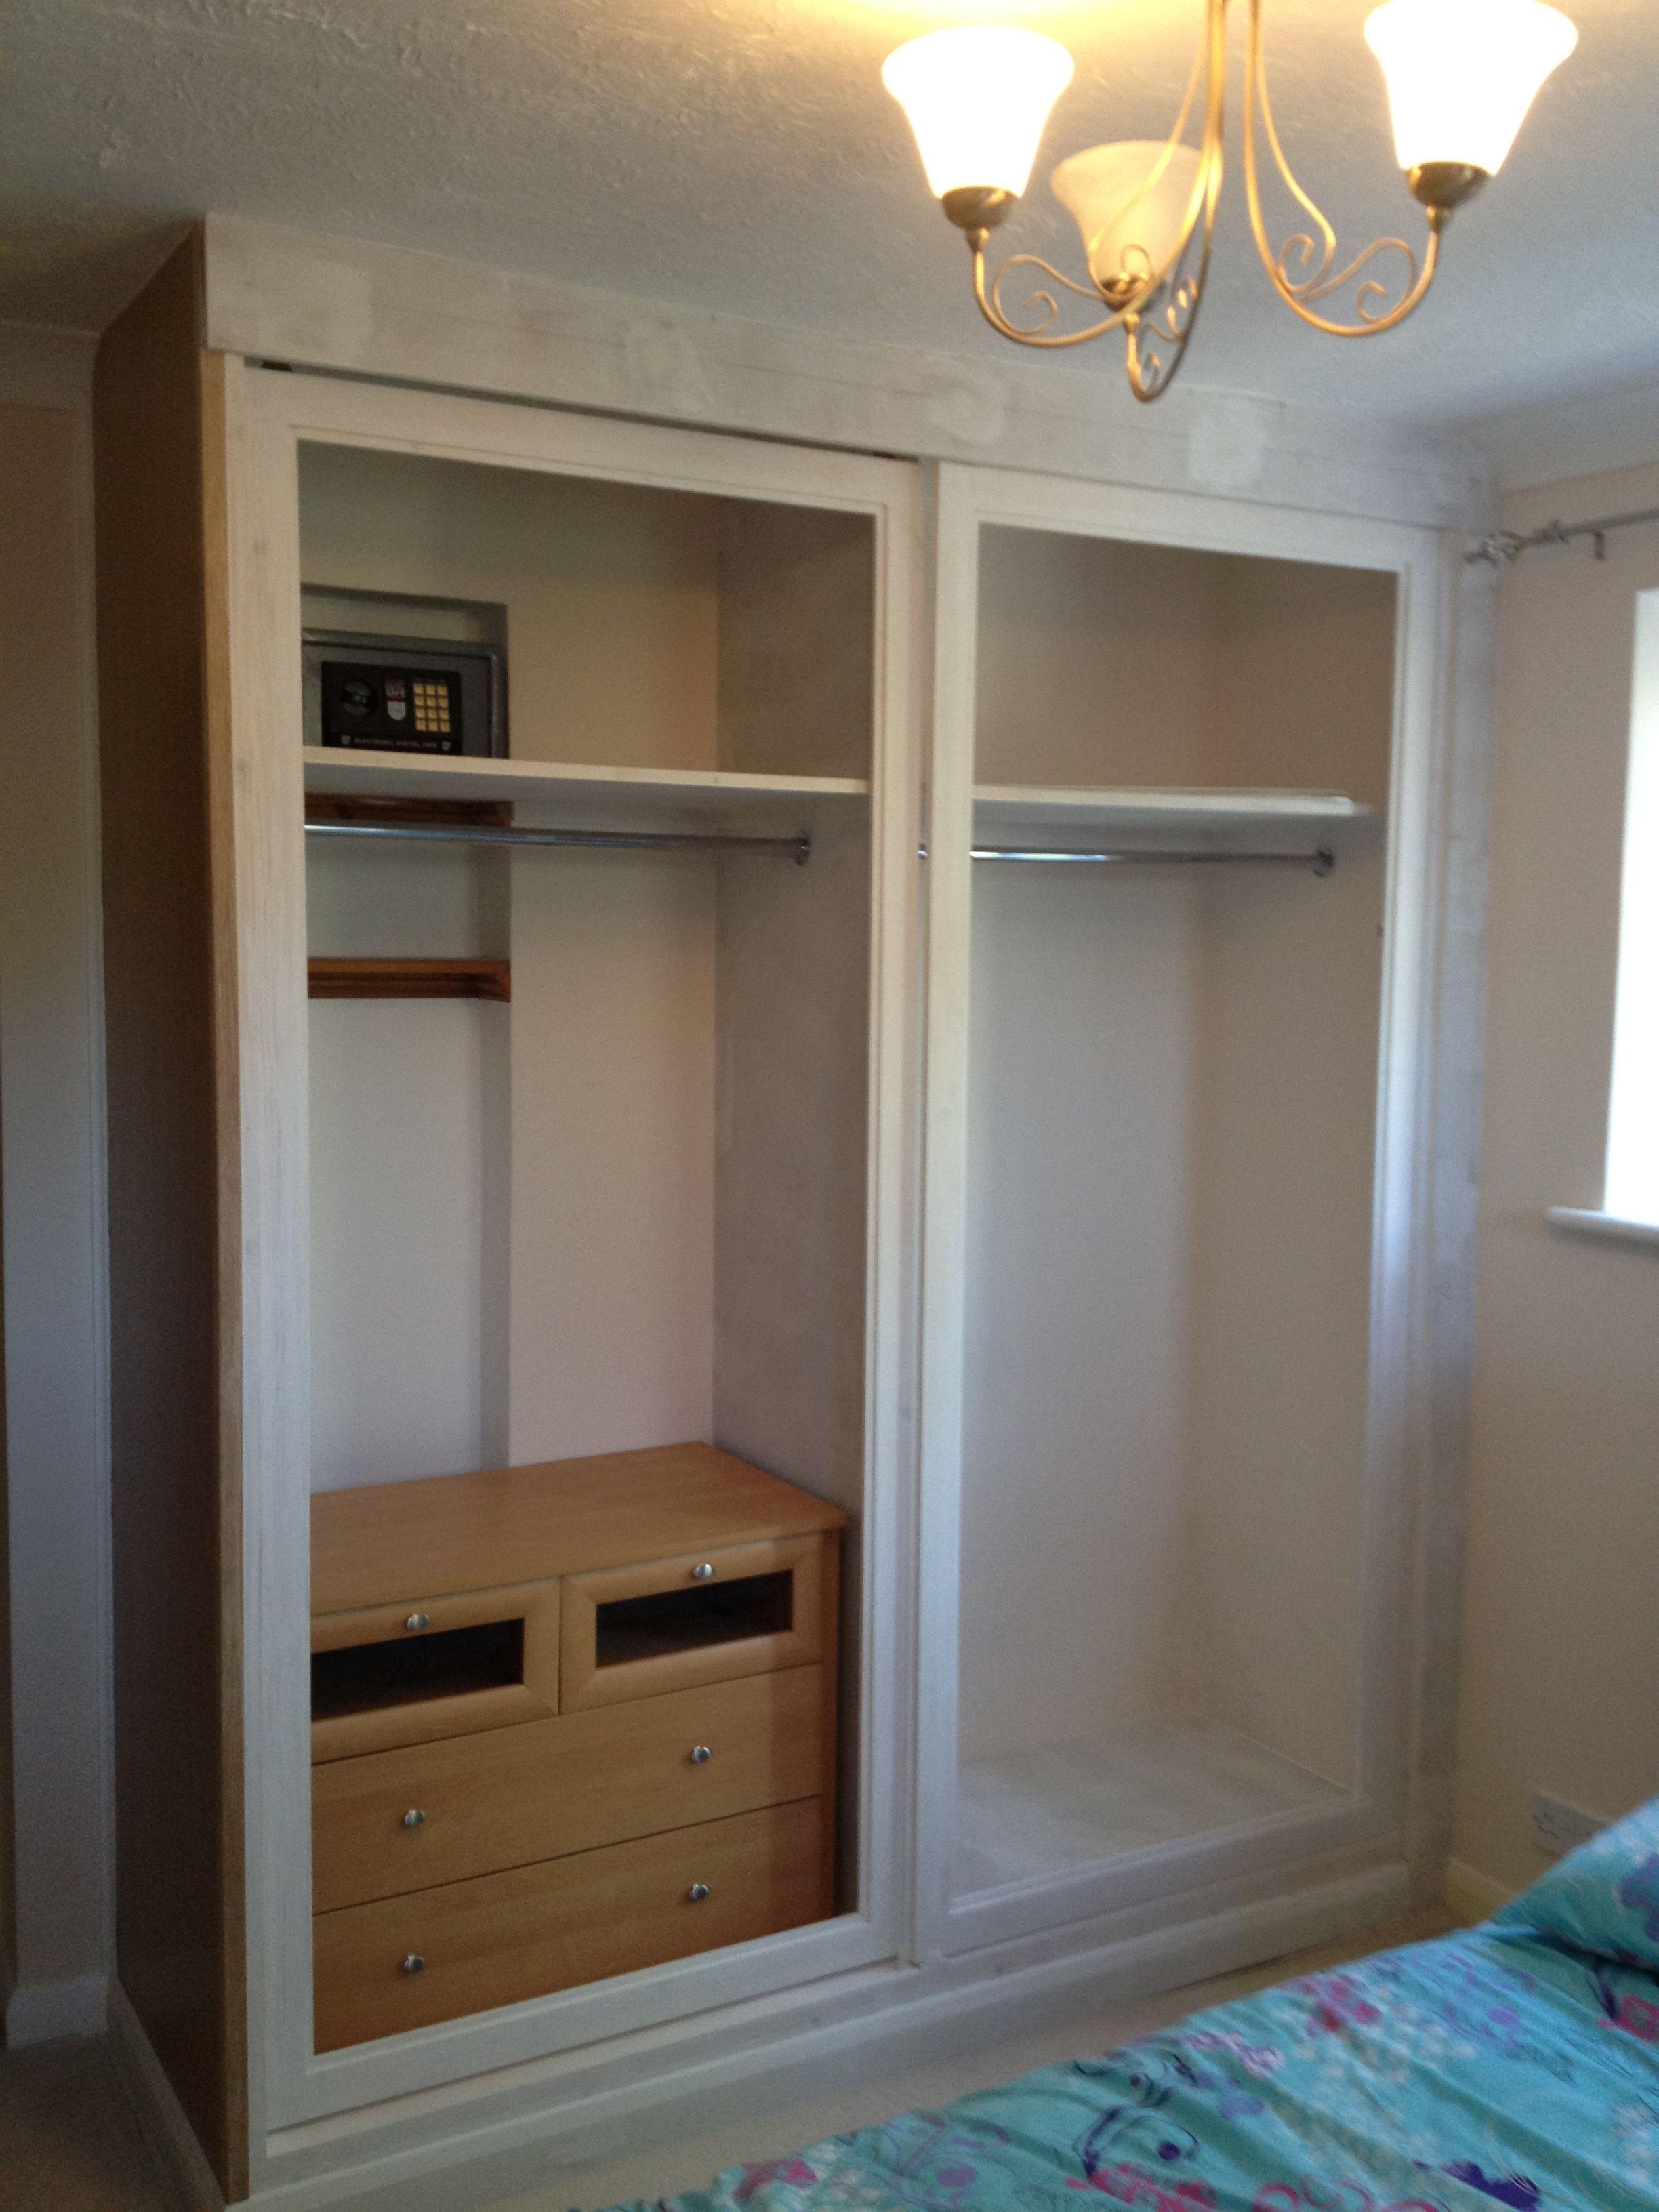 Alternatives To Mirrored Closet Doors